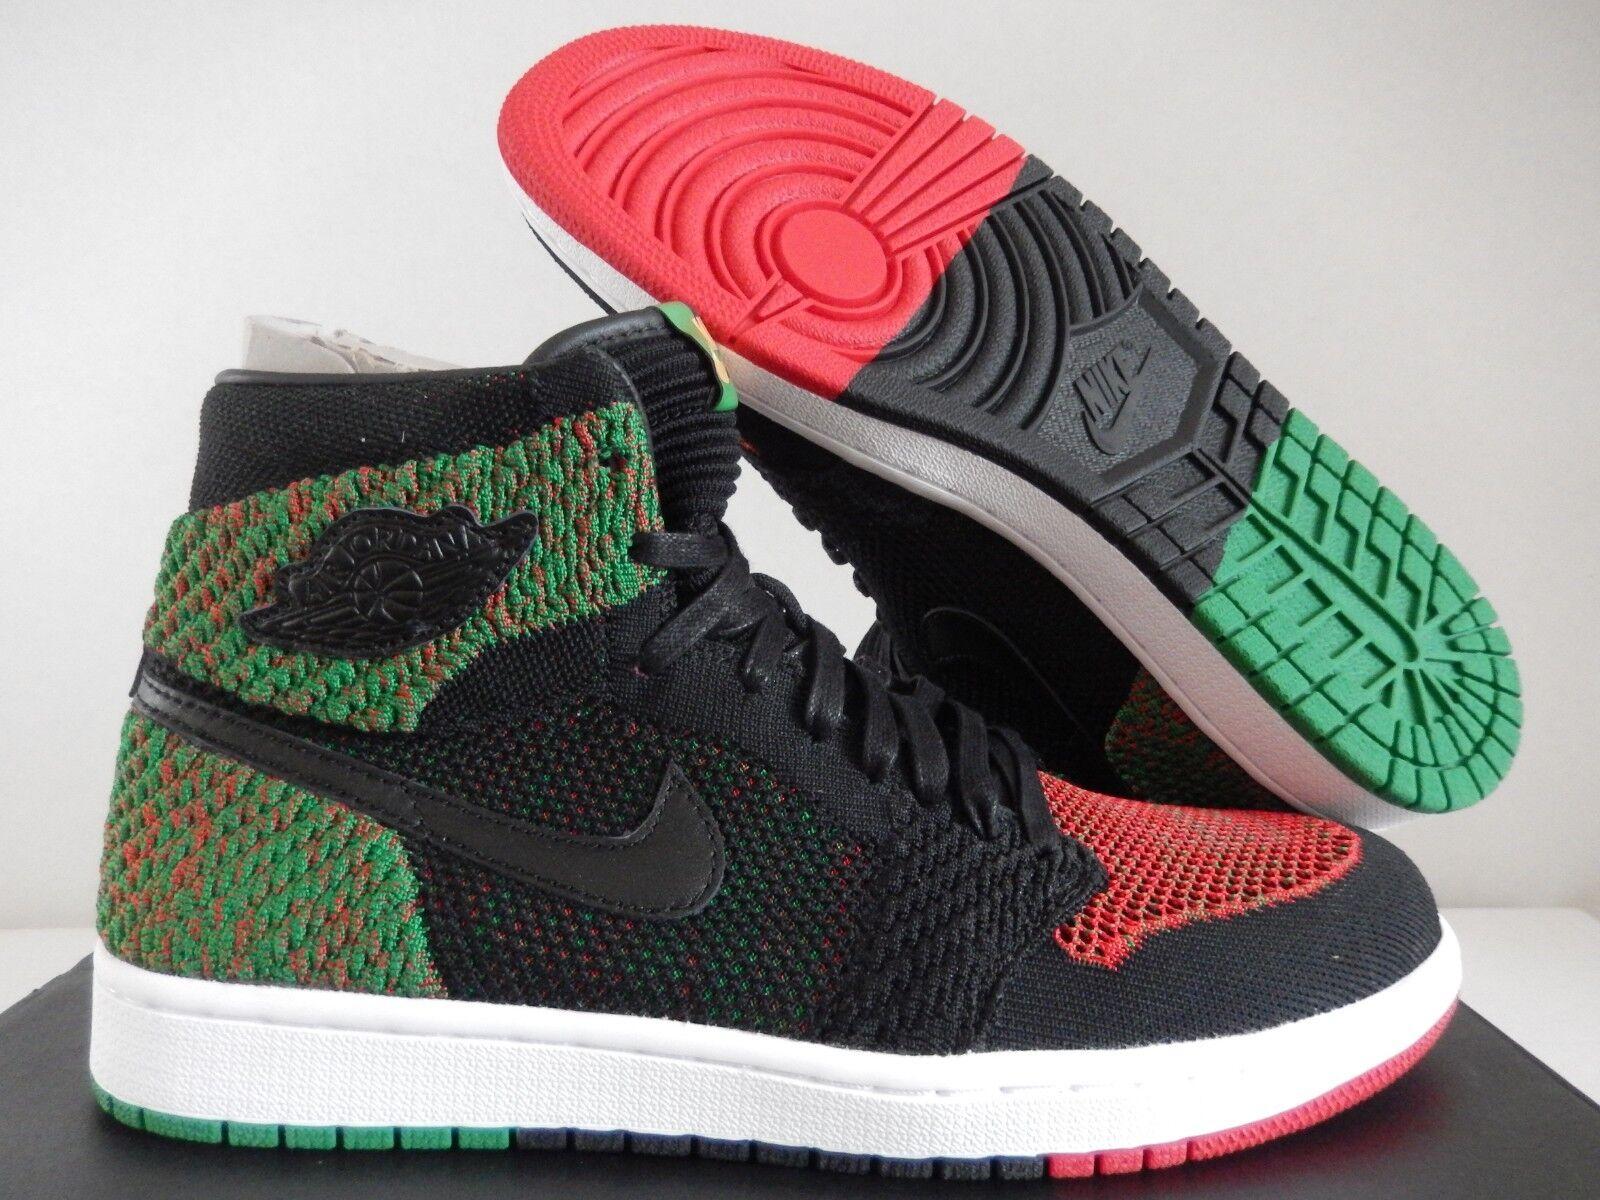 Nike Air Flyknit Jordan 1 Retro Alta Flyknit Air BHM multi color [AA2426026] 591dae